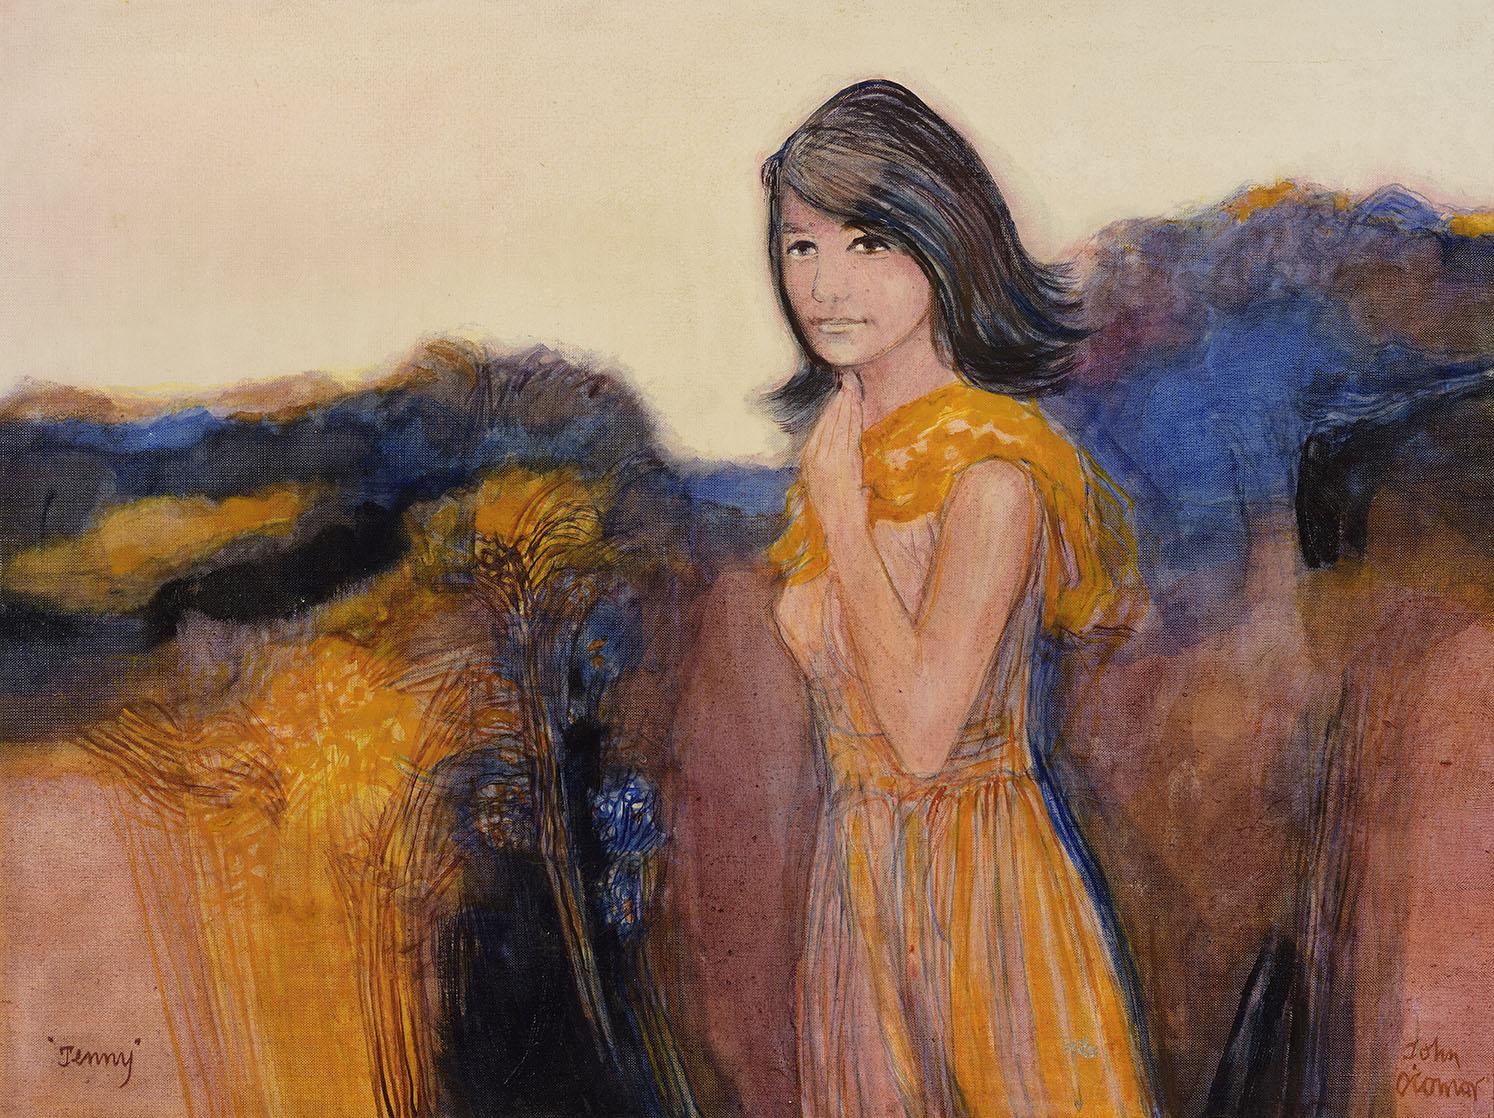 John Scorror O'Connor RWS, ARCA (1913-2004)    Jenny Bone,  c.1968, Oil on canvas, 30 x 40 in, Signed  [CAS 61] Donated by Geoffrey Bone in 2003